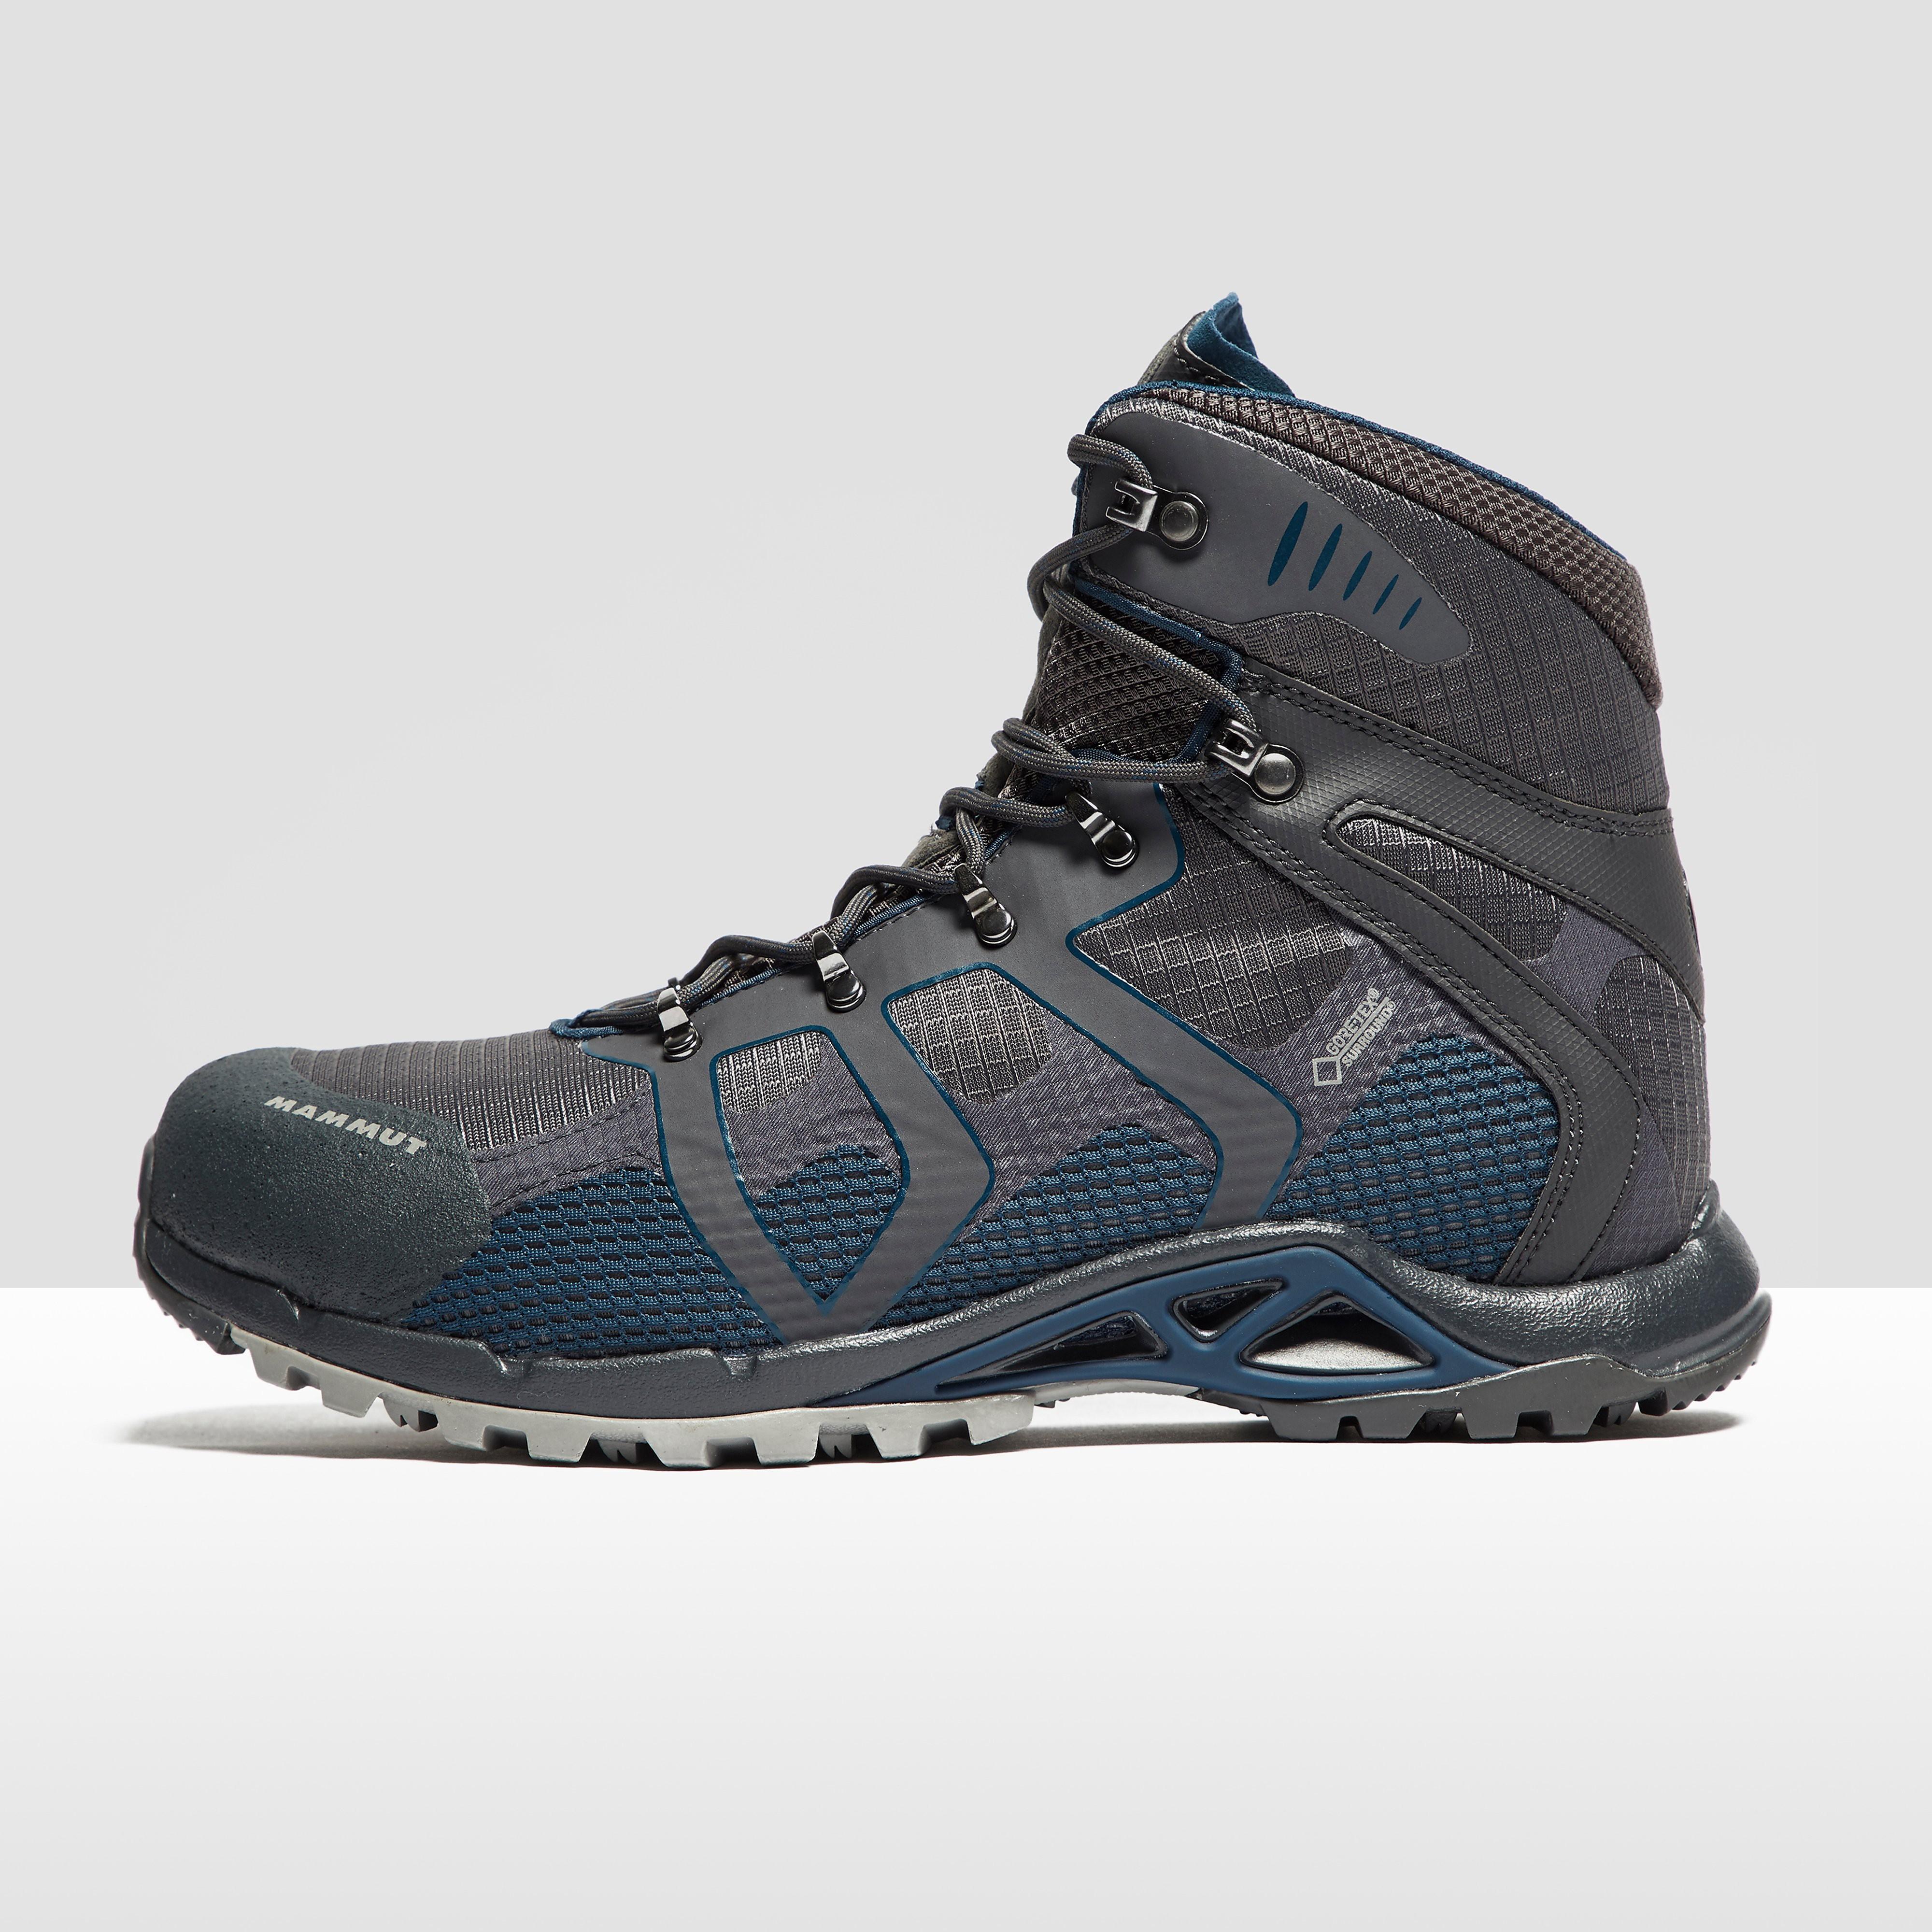 Mammut Men's Comfort High GORE-TEX Surround Boots